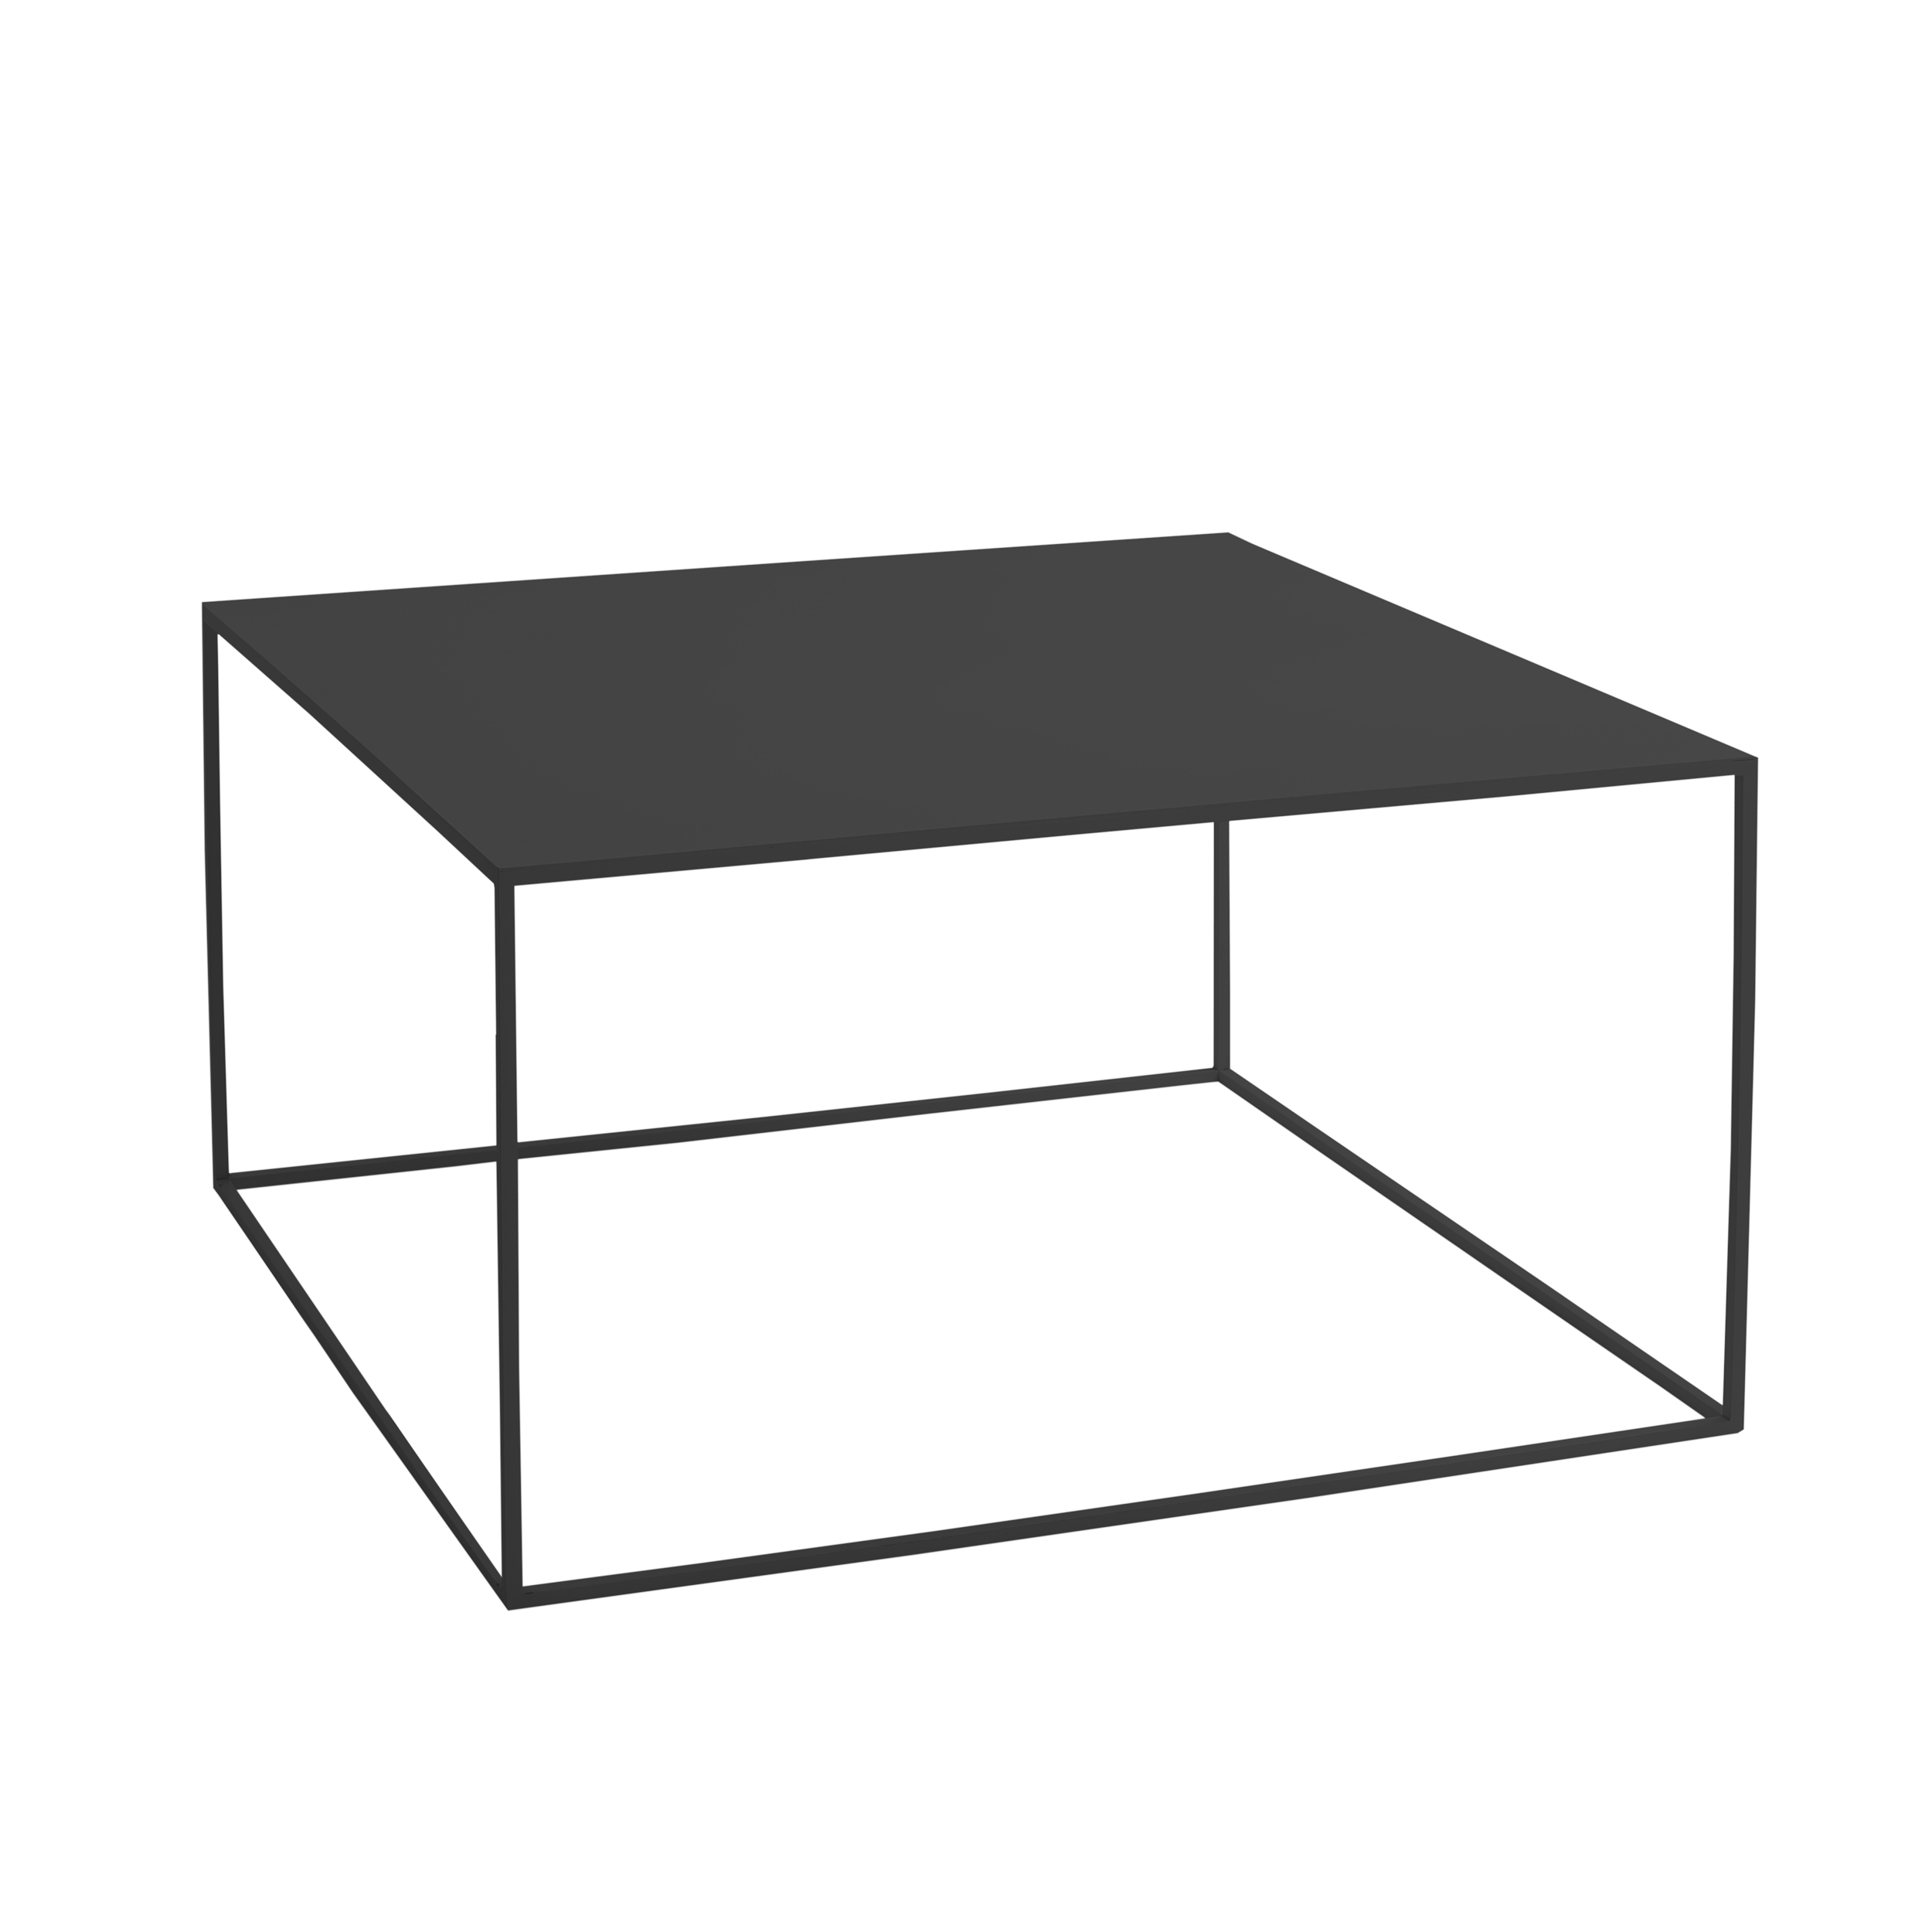 Coffee Table Tensio Metal 80 x 80 cm | Black